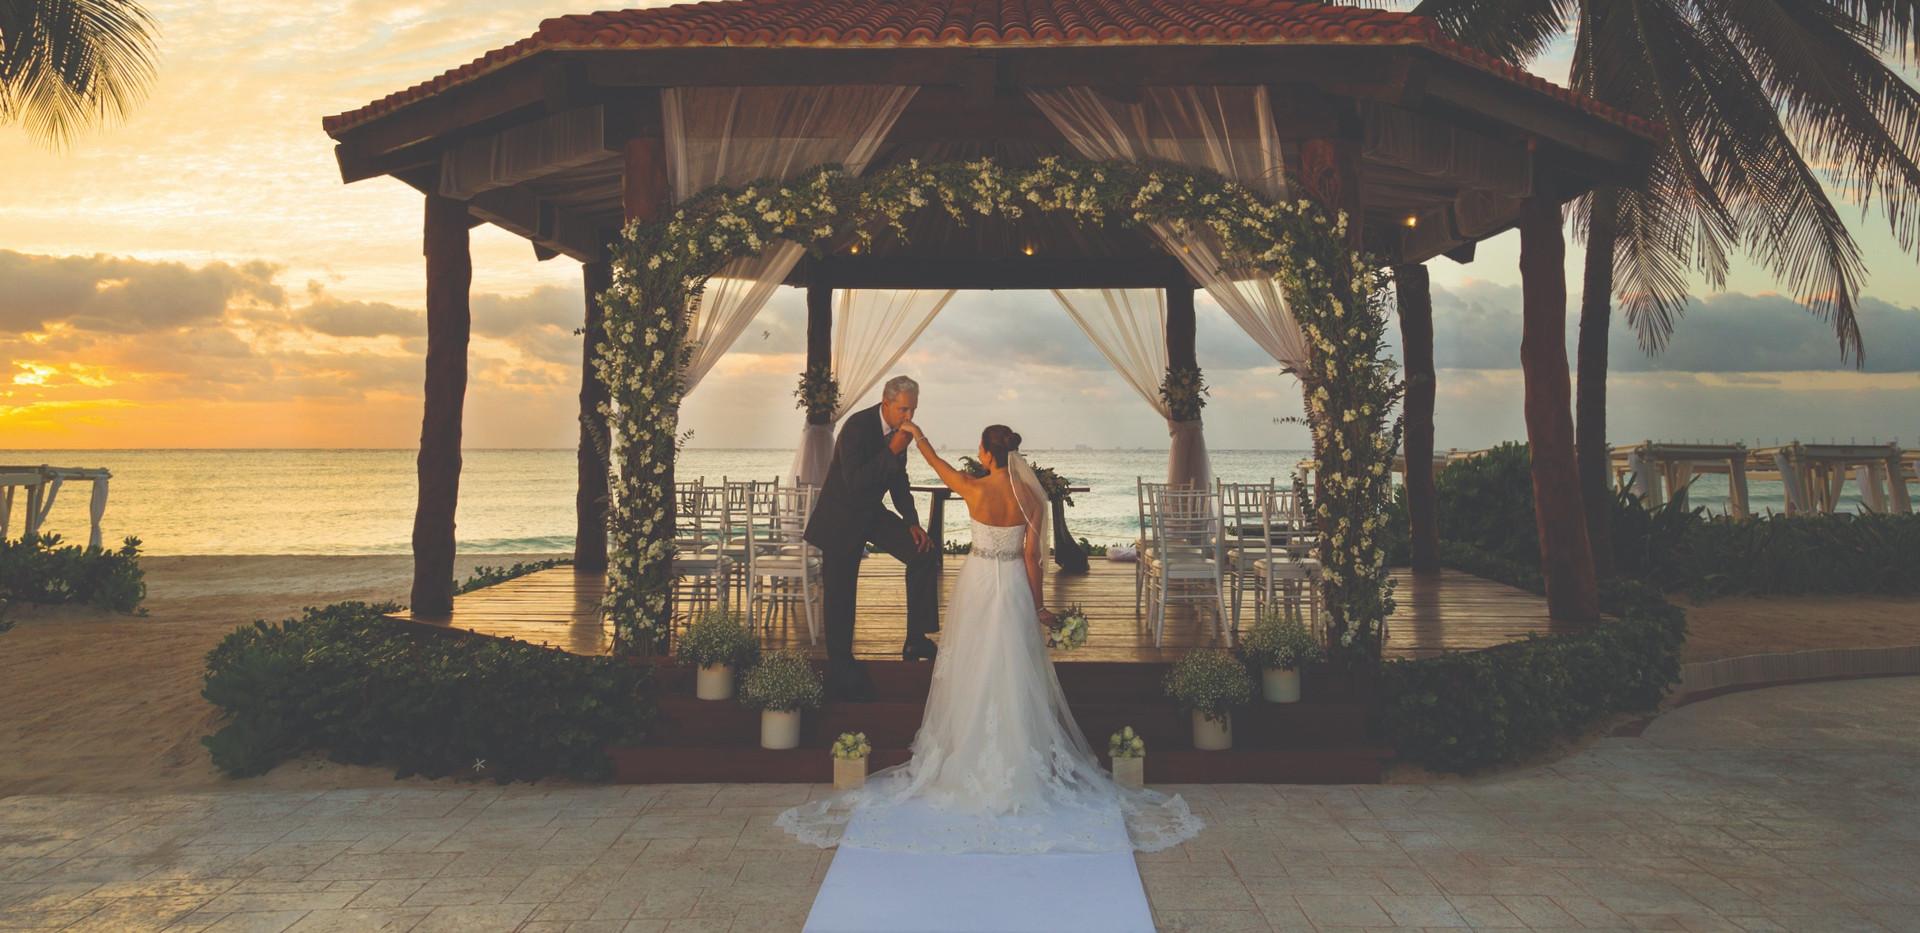 Hilton-Playa-del-Carmen-Wedding-Gazebo-C